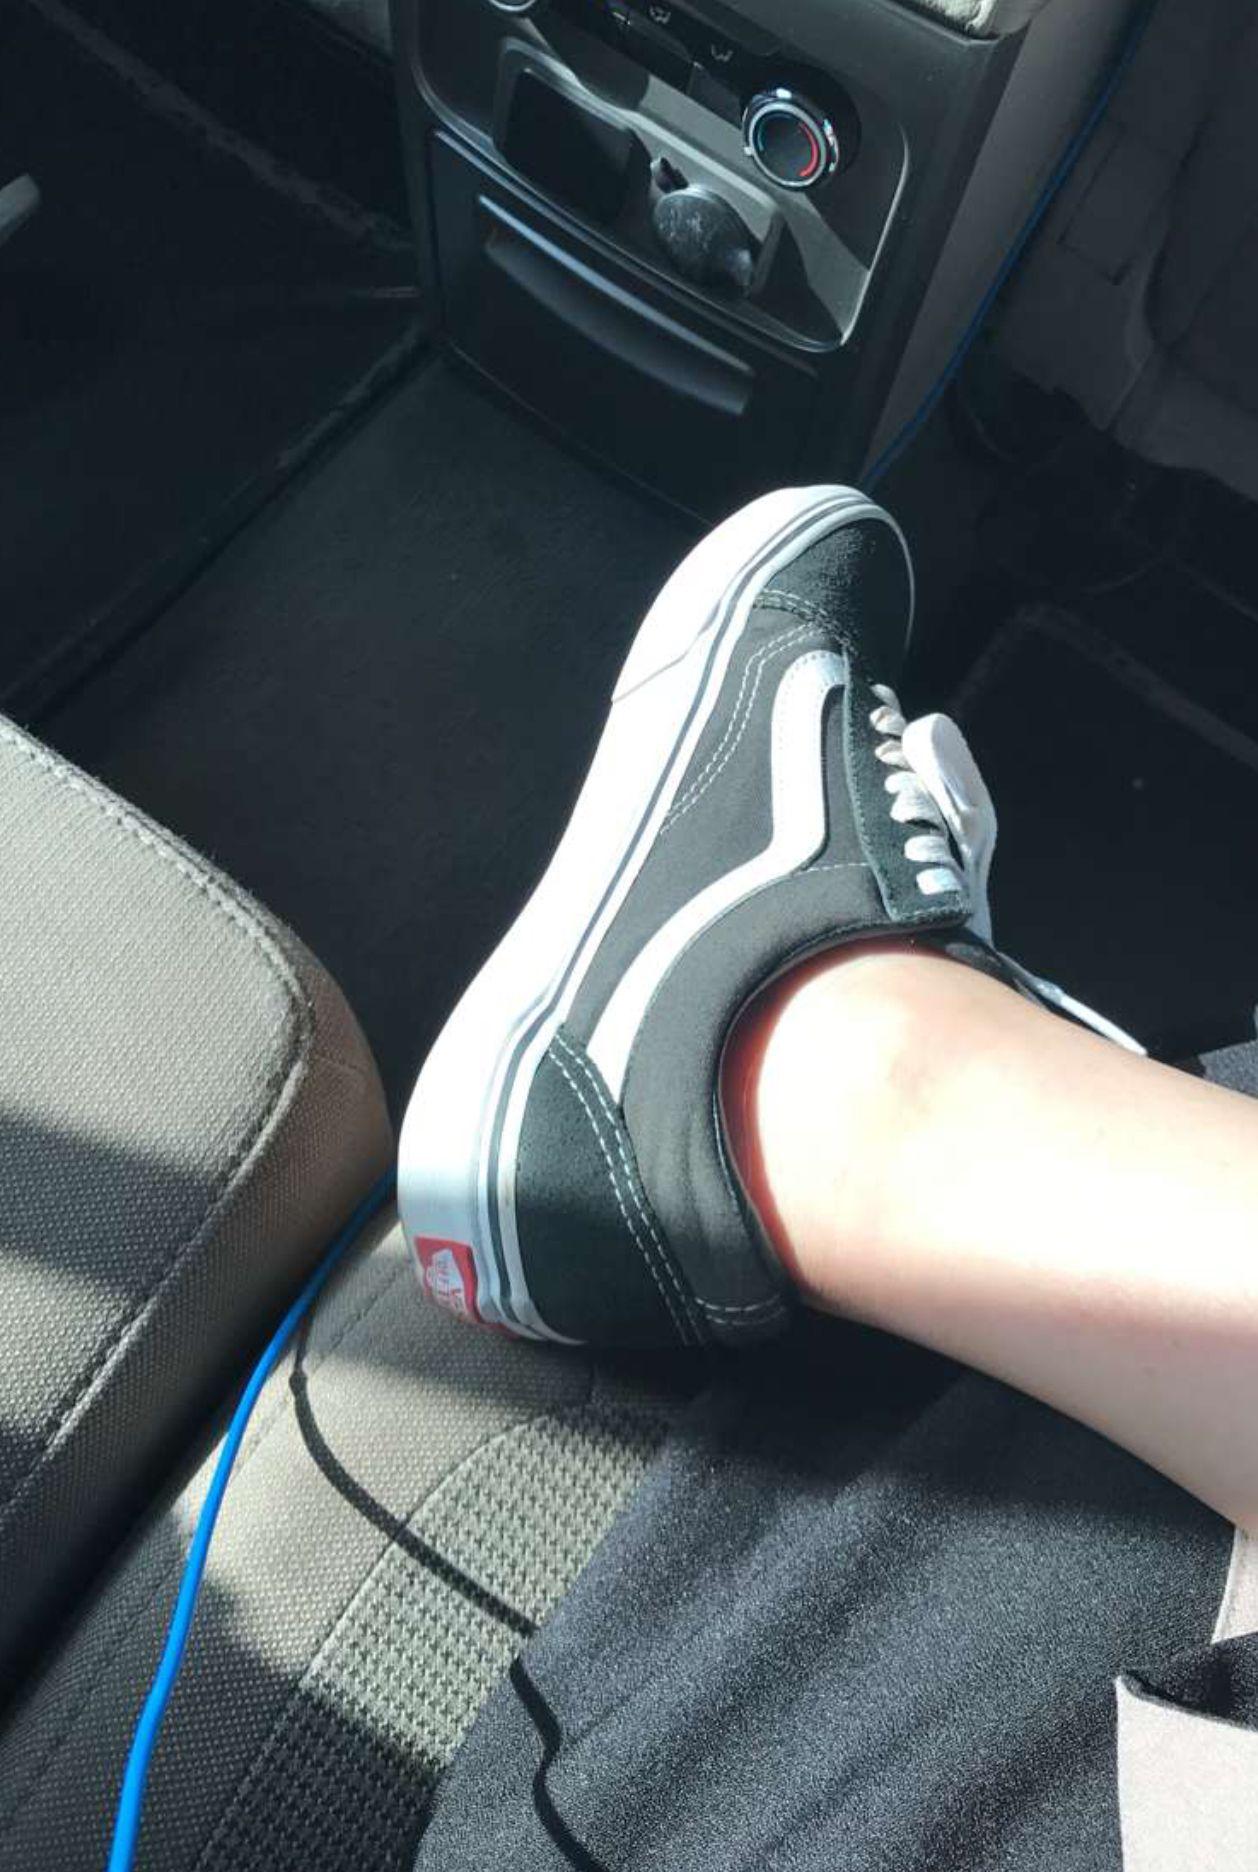 tumblr#tumblrshoes#girly #shoes#vans#accessories#heels#girl